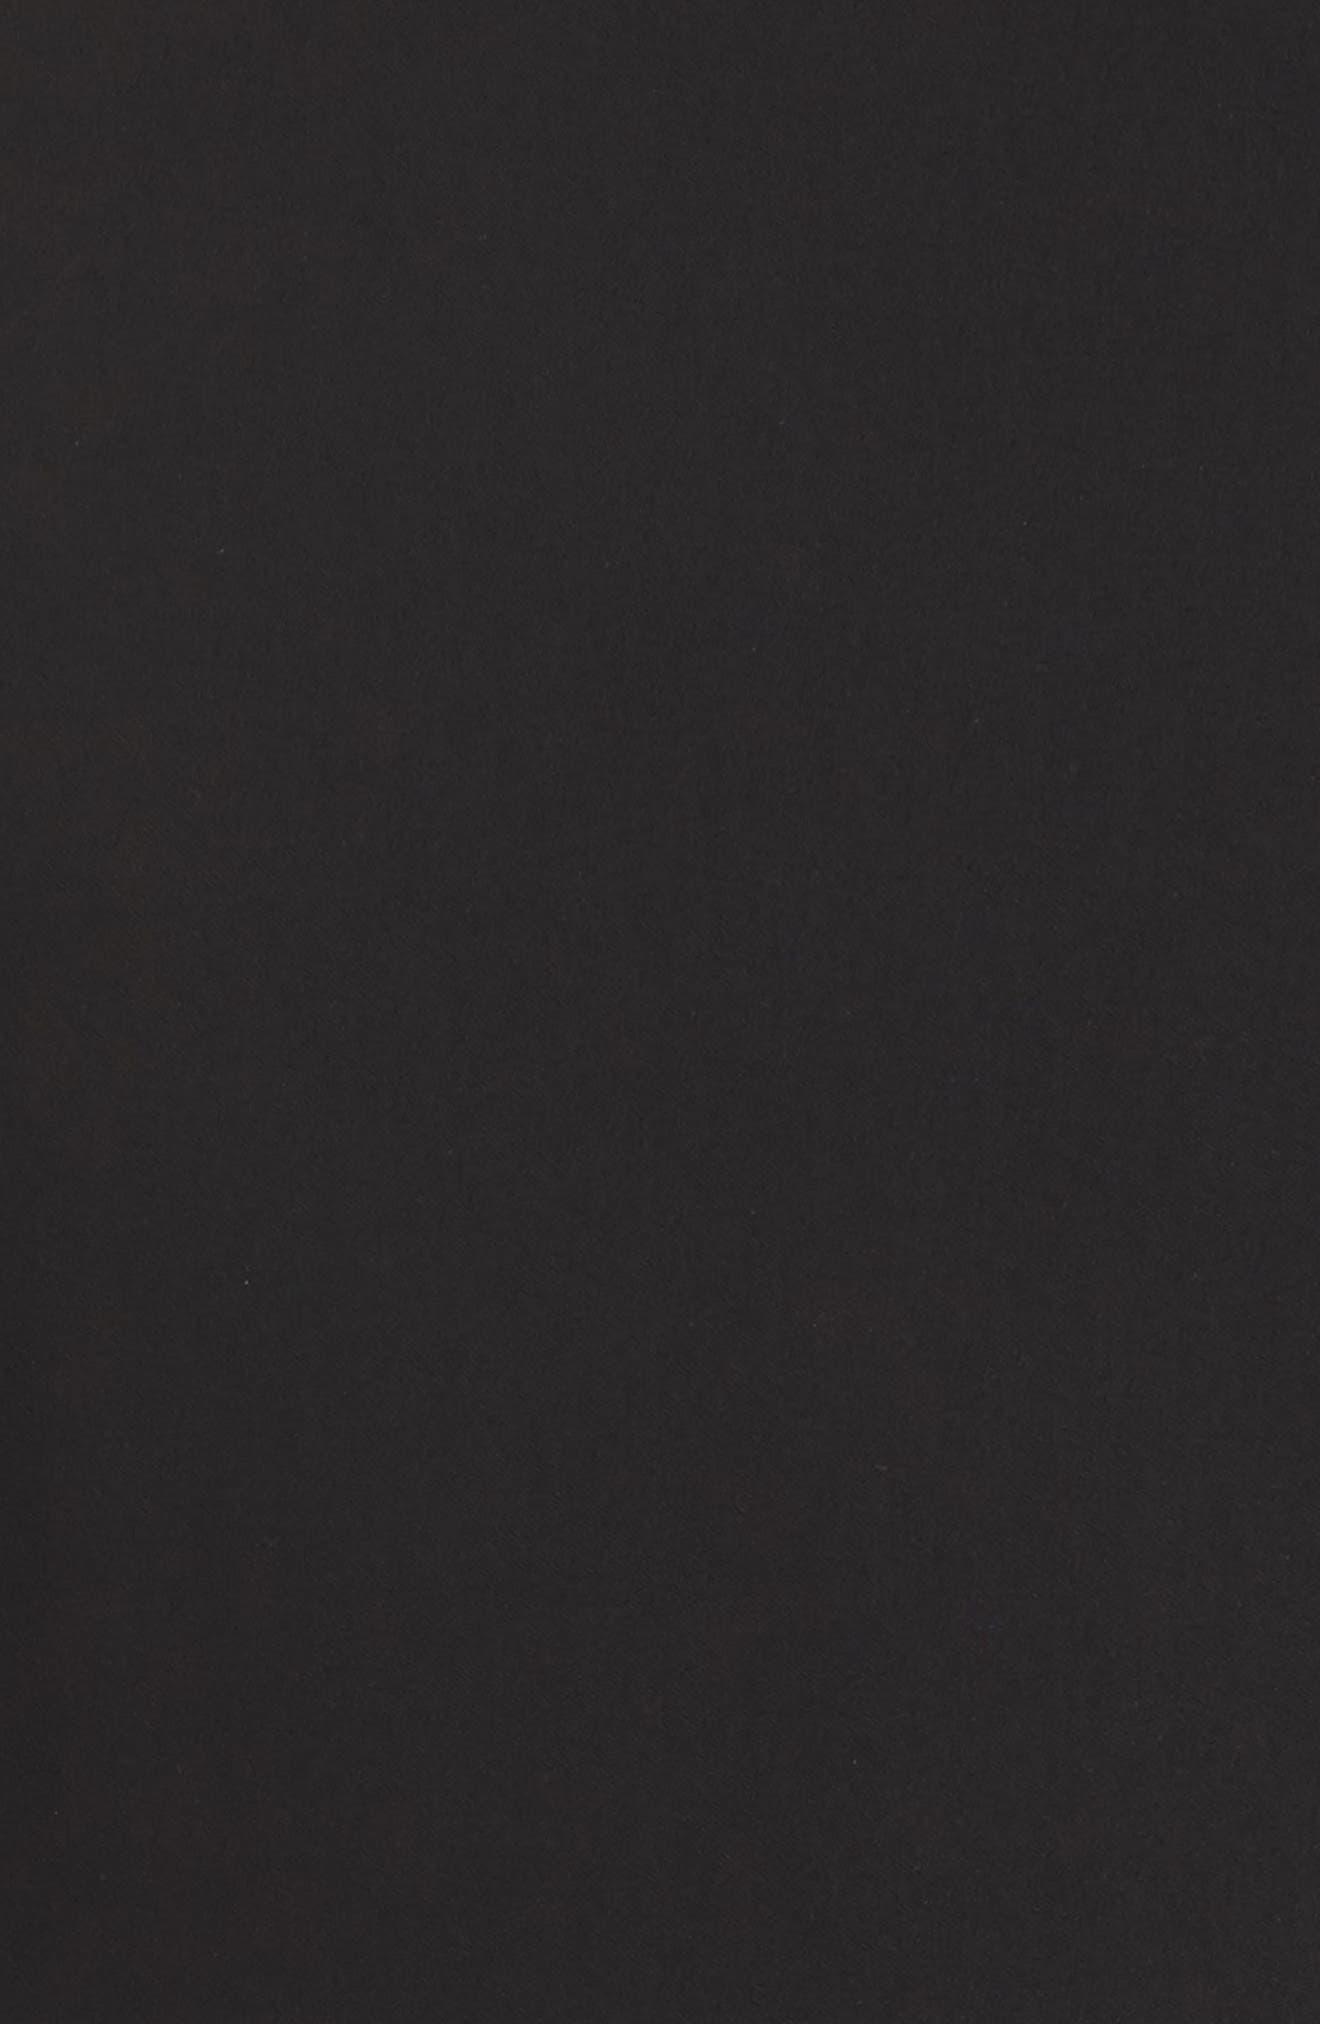 Split Sleeve Minidress,                             Alternate thumbnail 5, color,                             Black